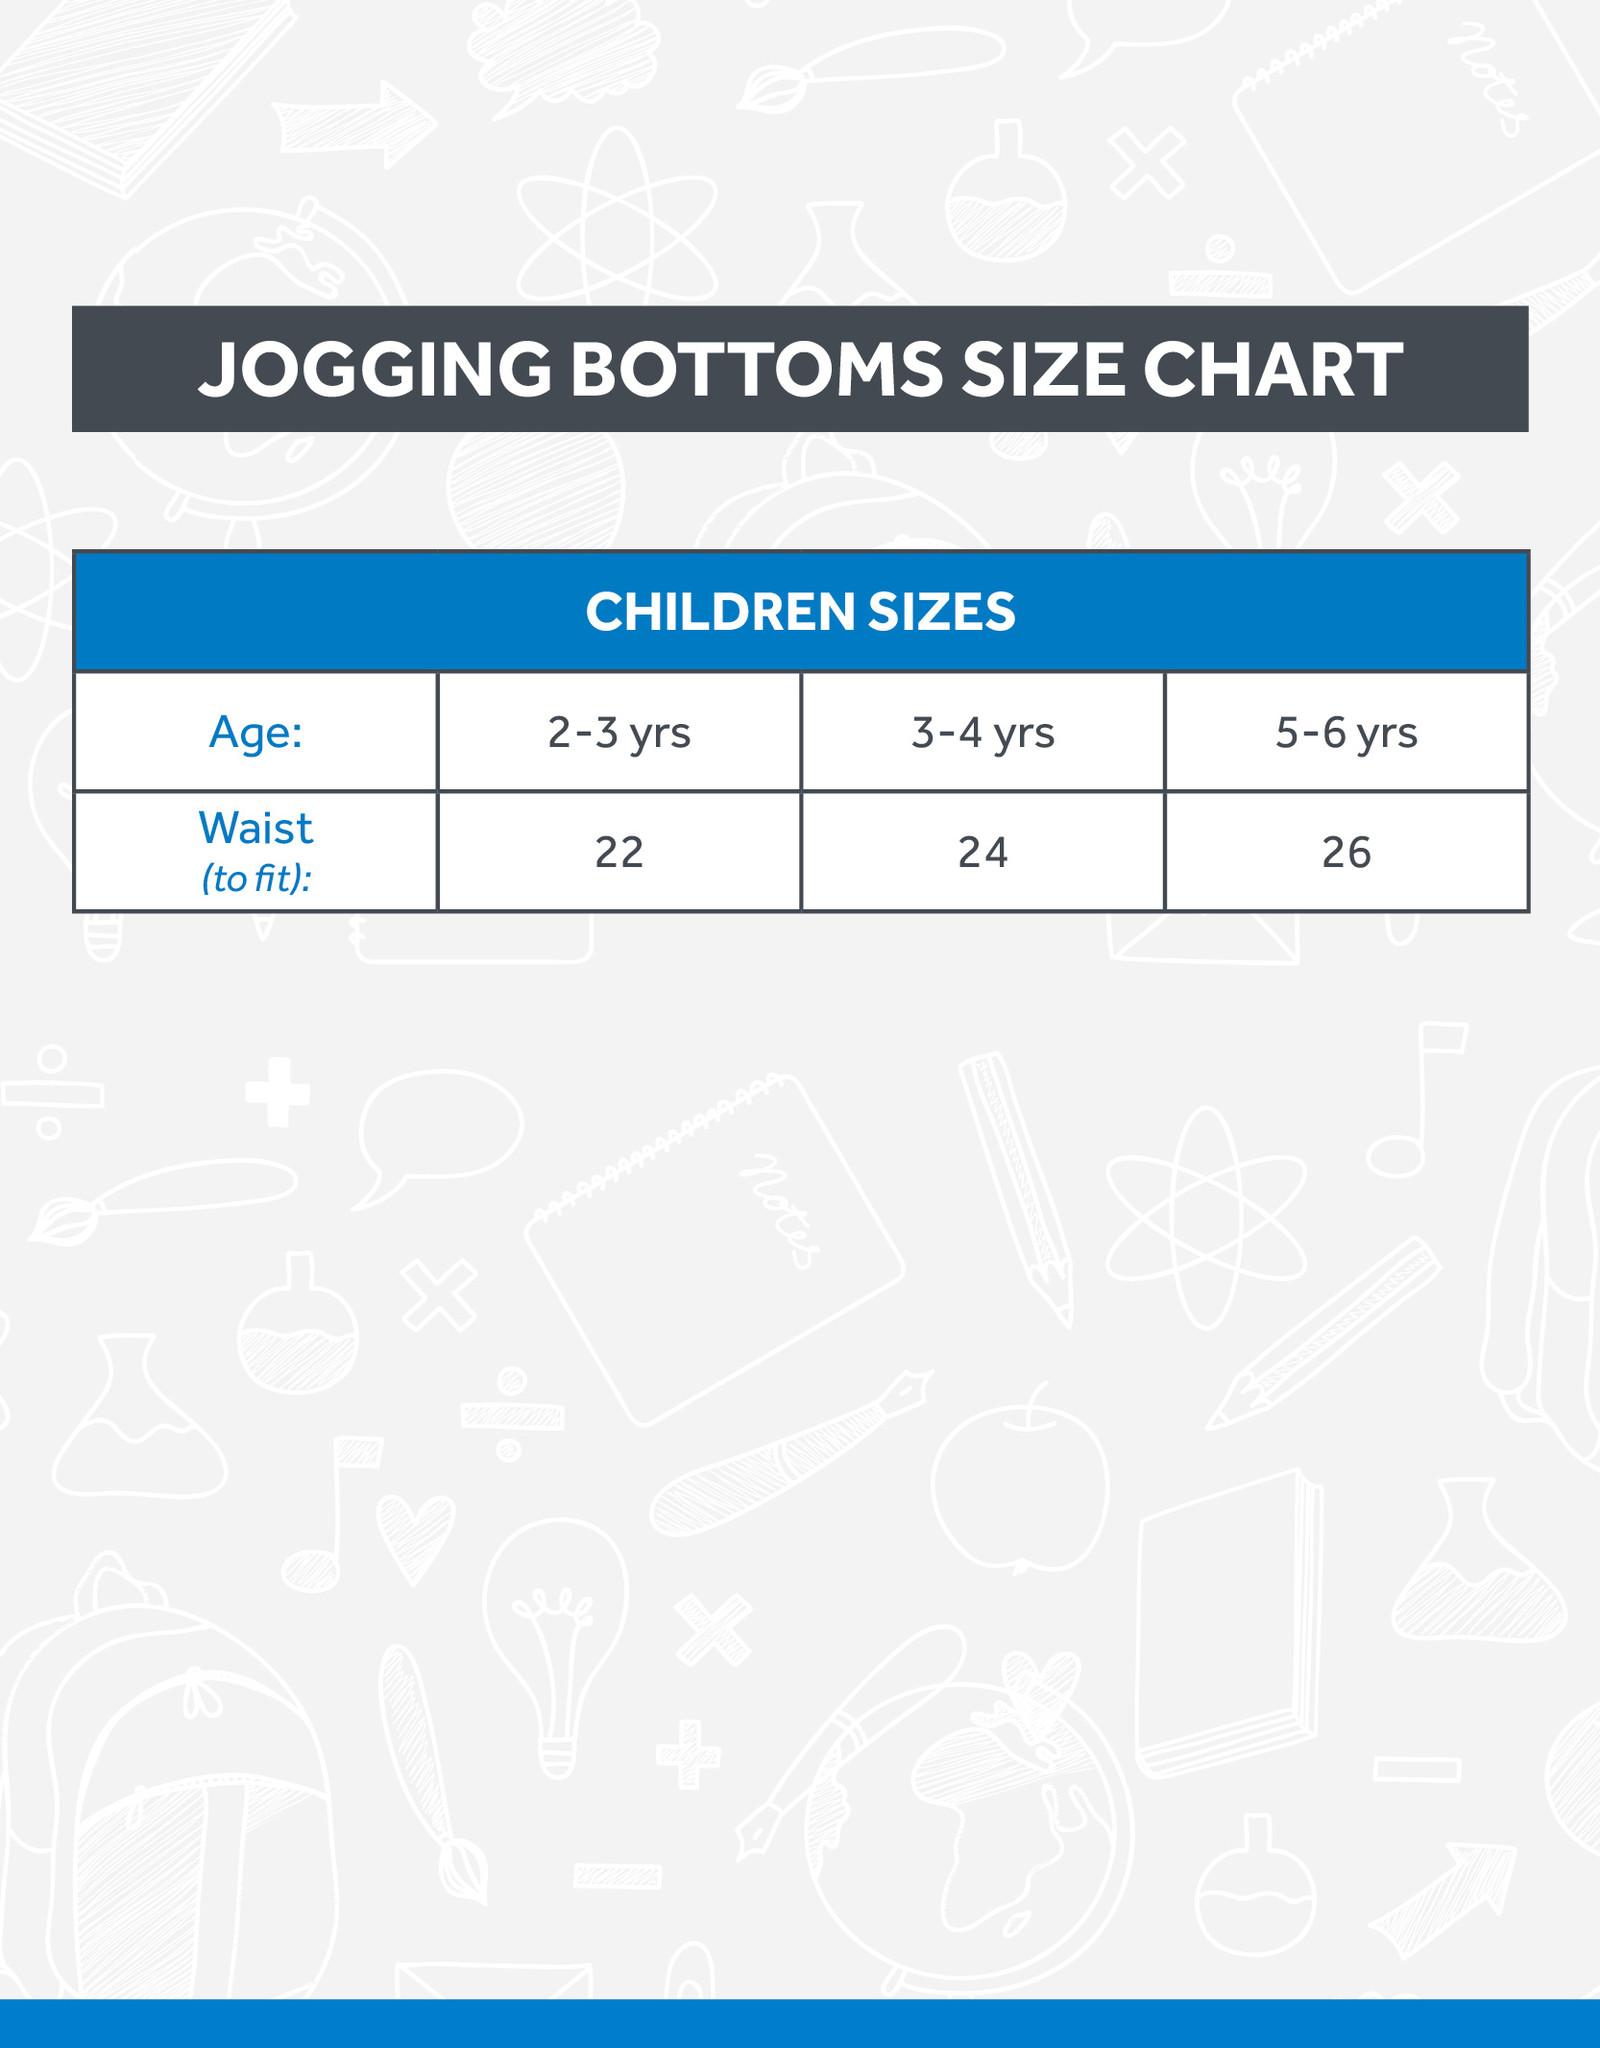 DT Towerview Nursery Jog Bottoms (DT)